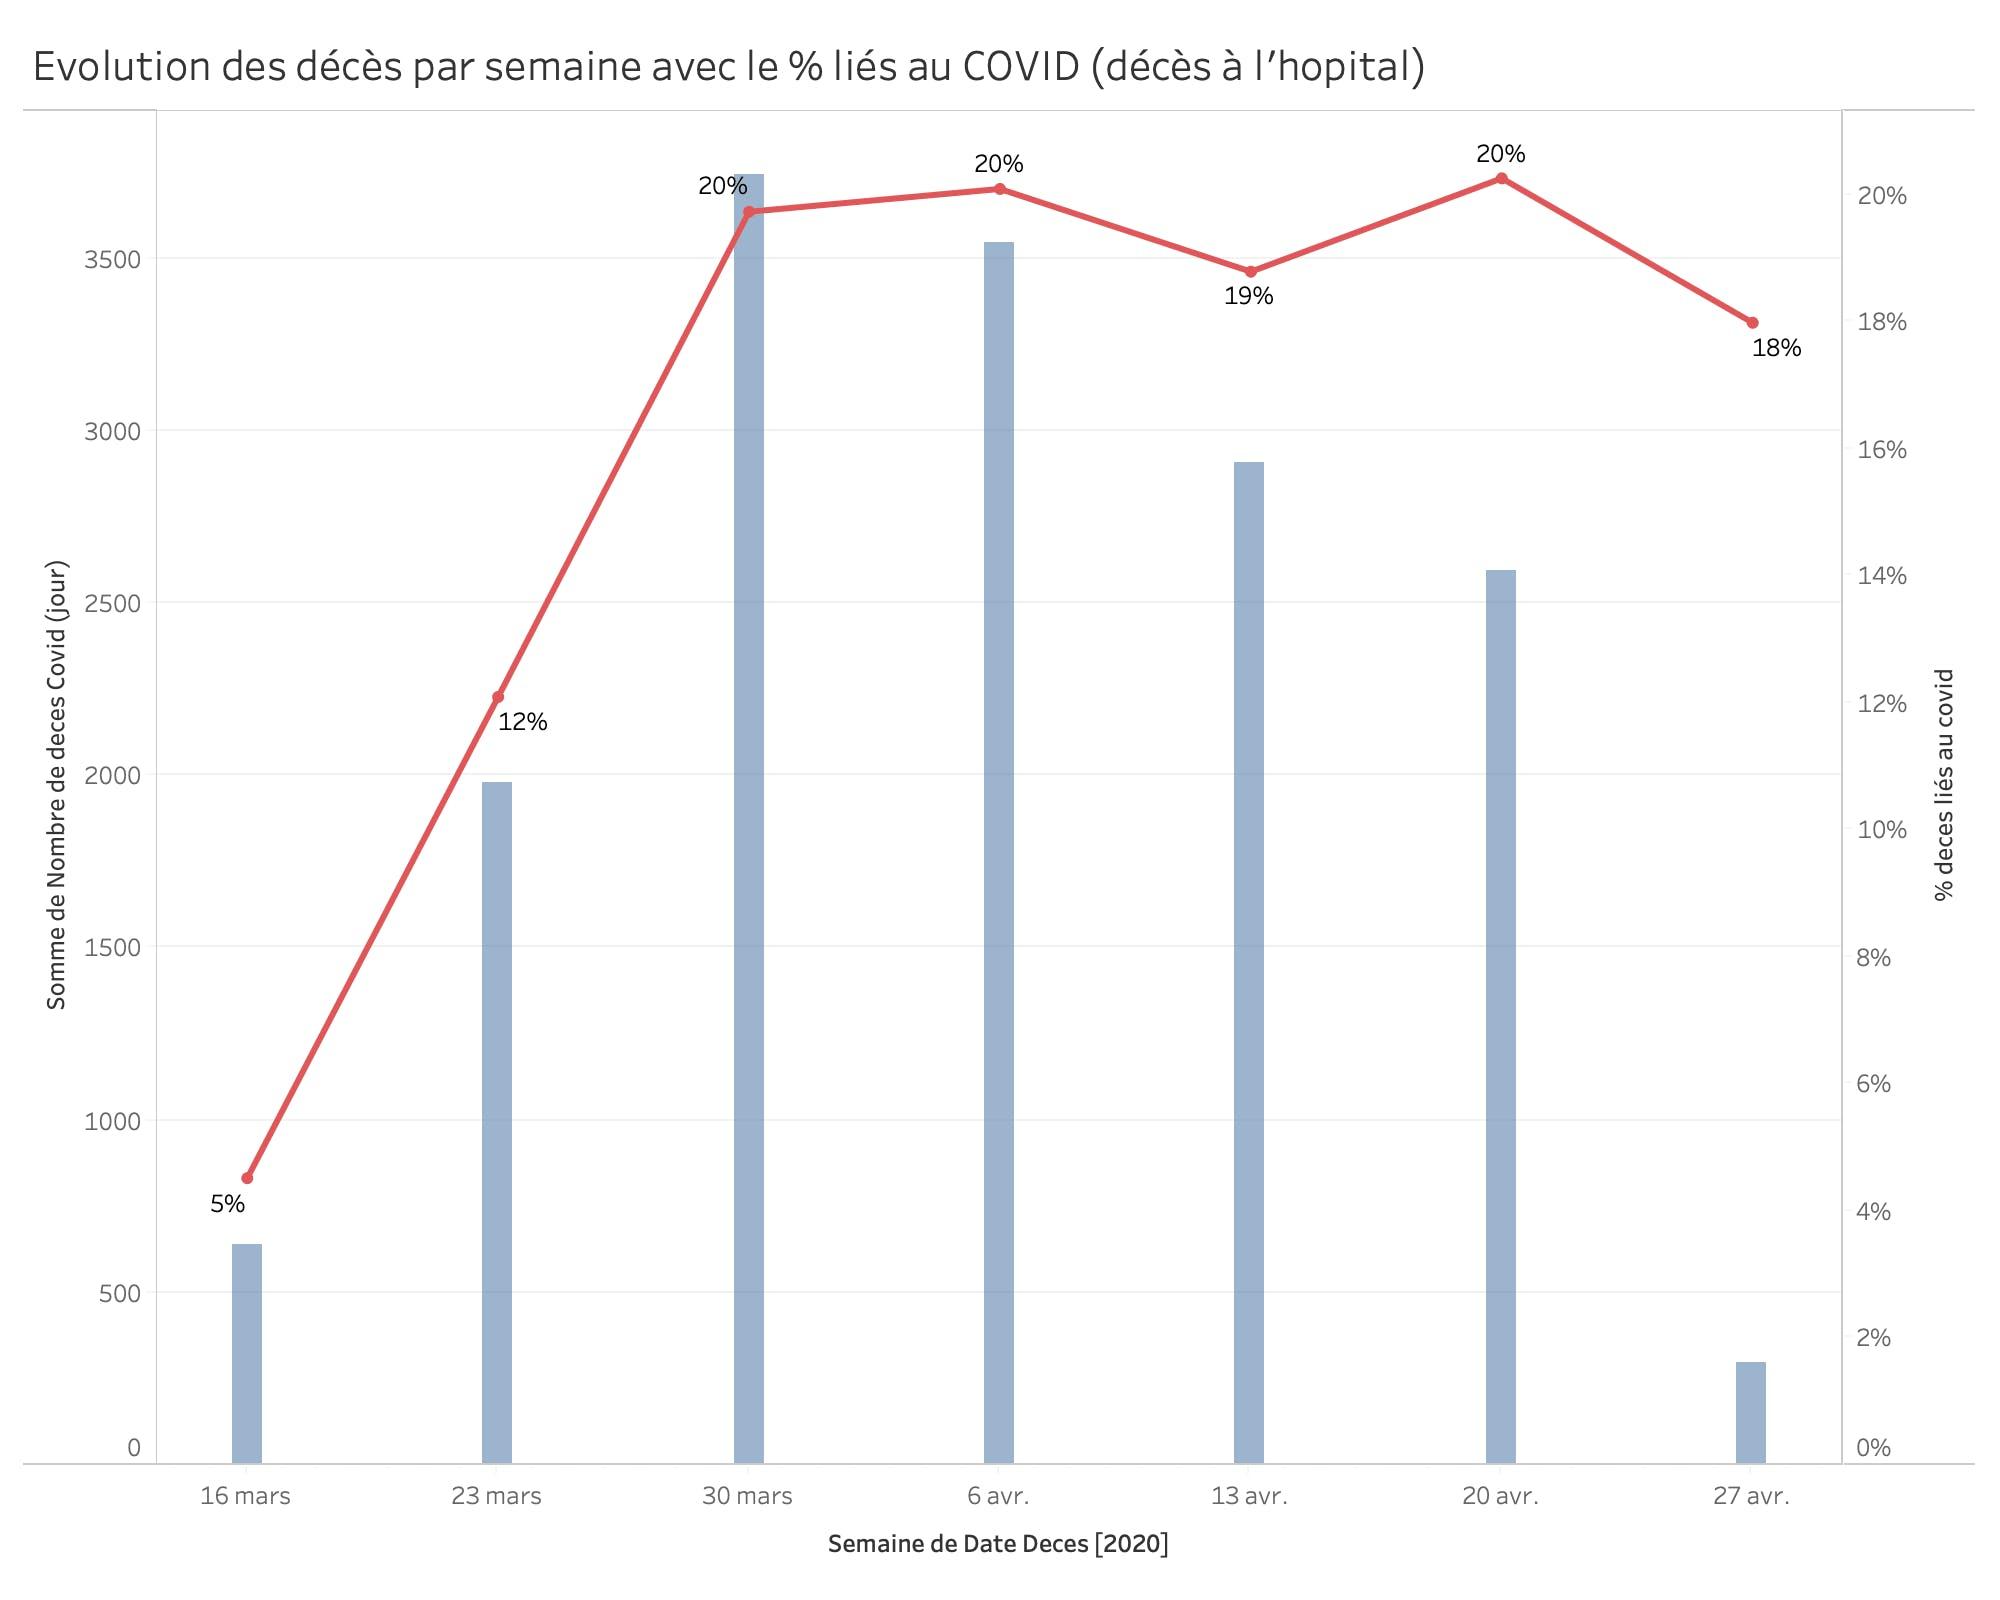 Evol deces Covid entre le 16 mars et 11 mai 2020